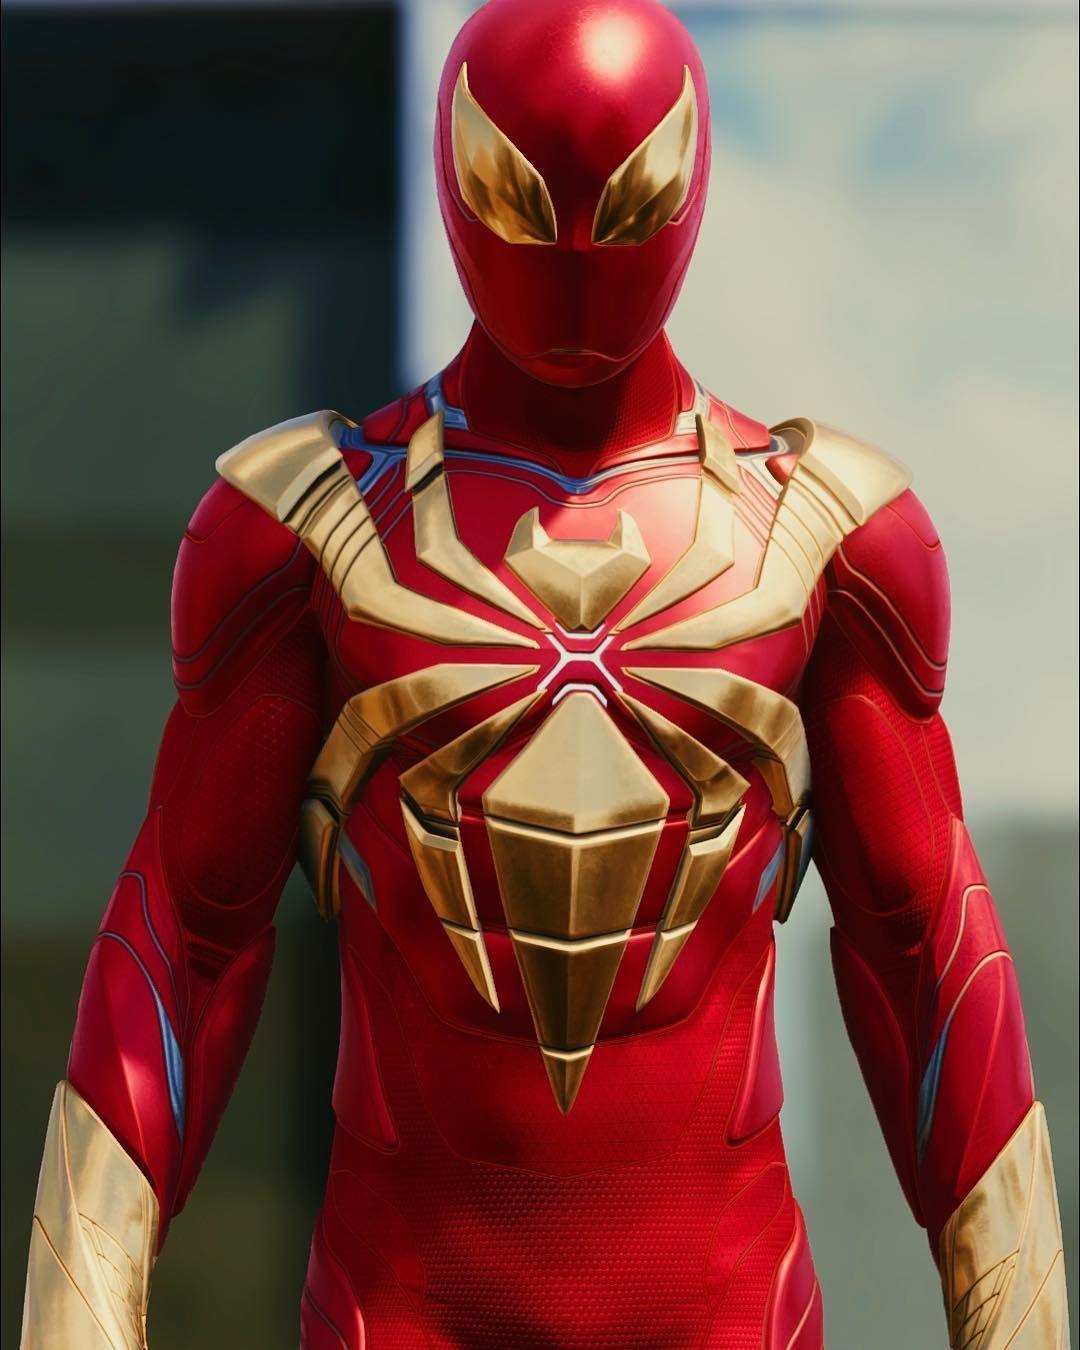 Spidey Suit Series The Original Iron Spider